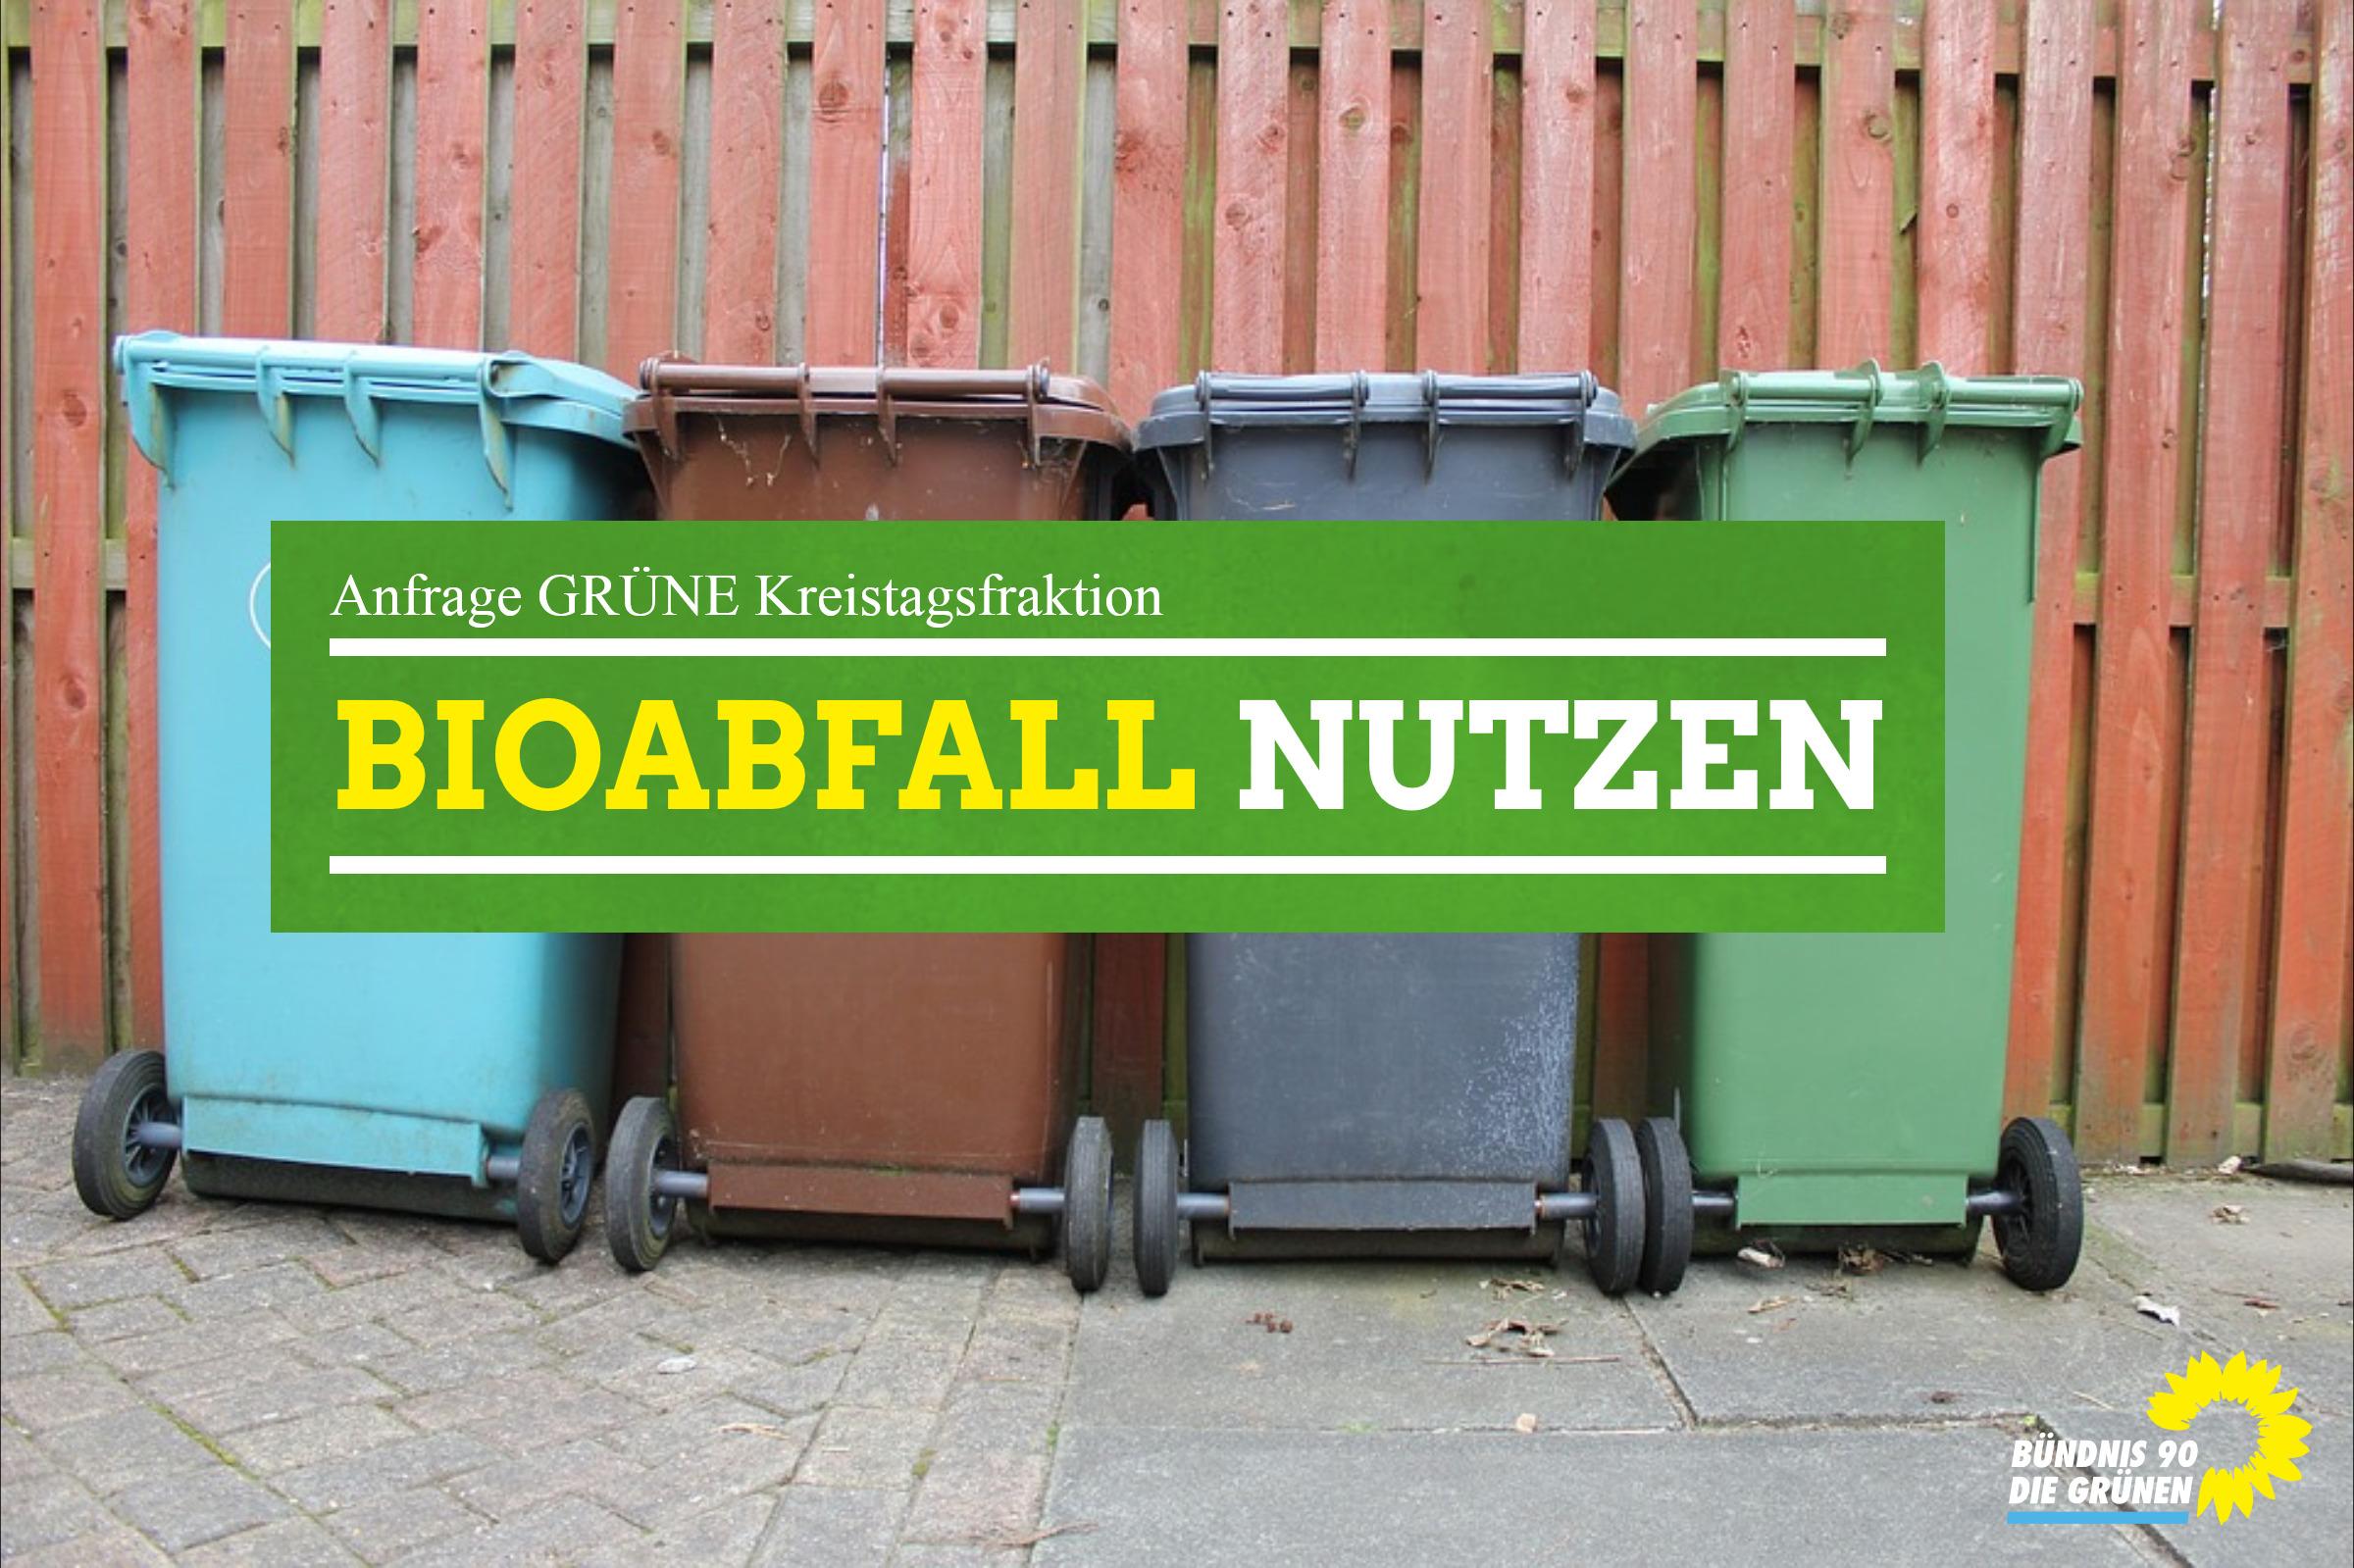 Bioabfall nutzen